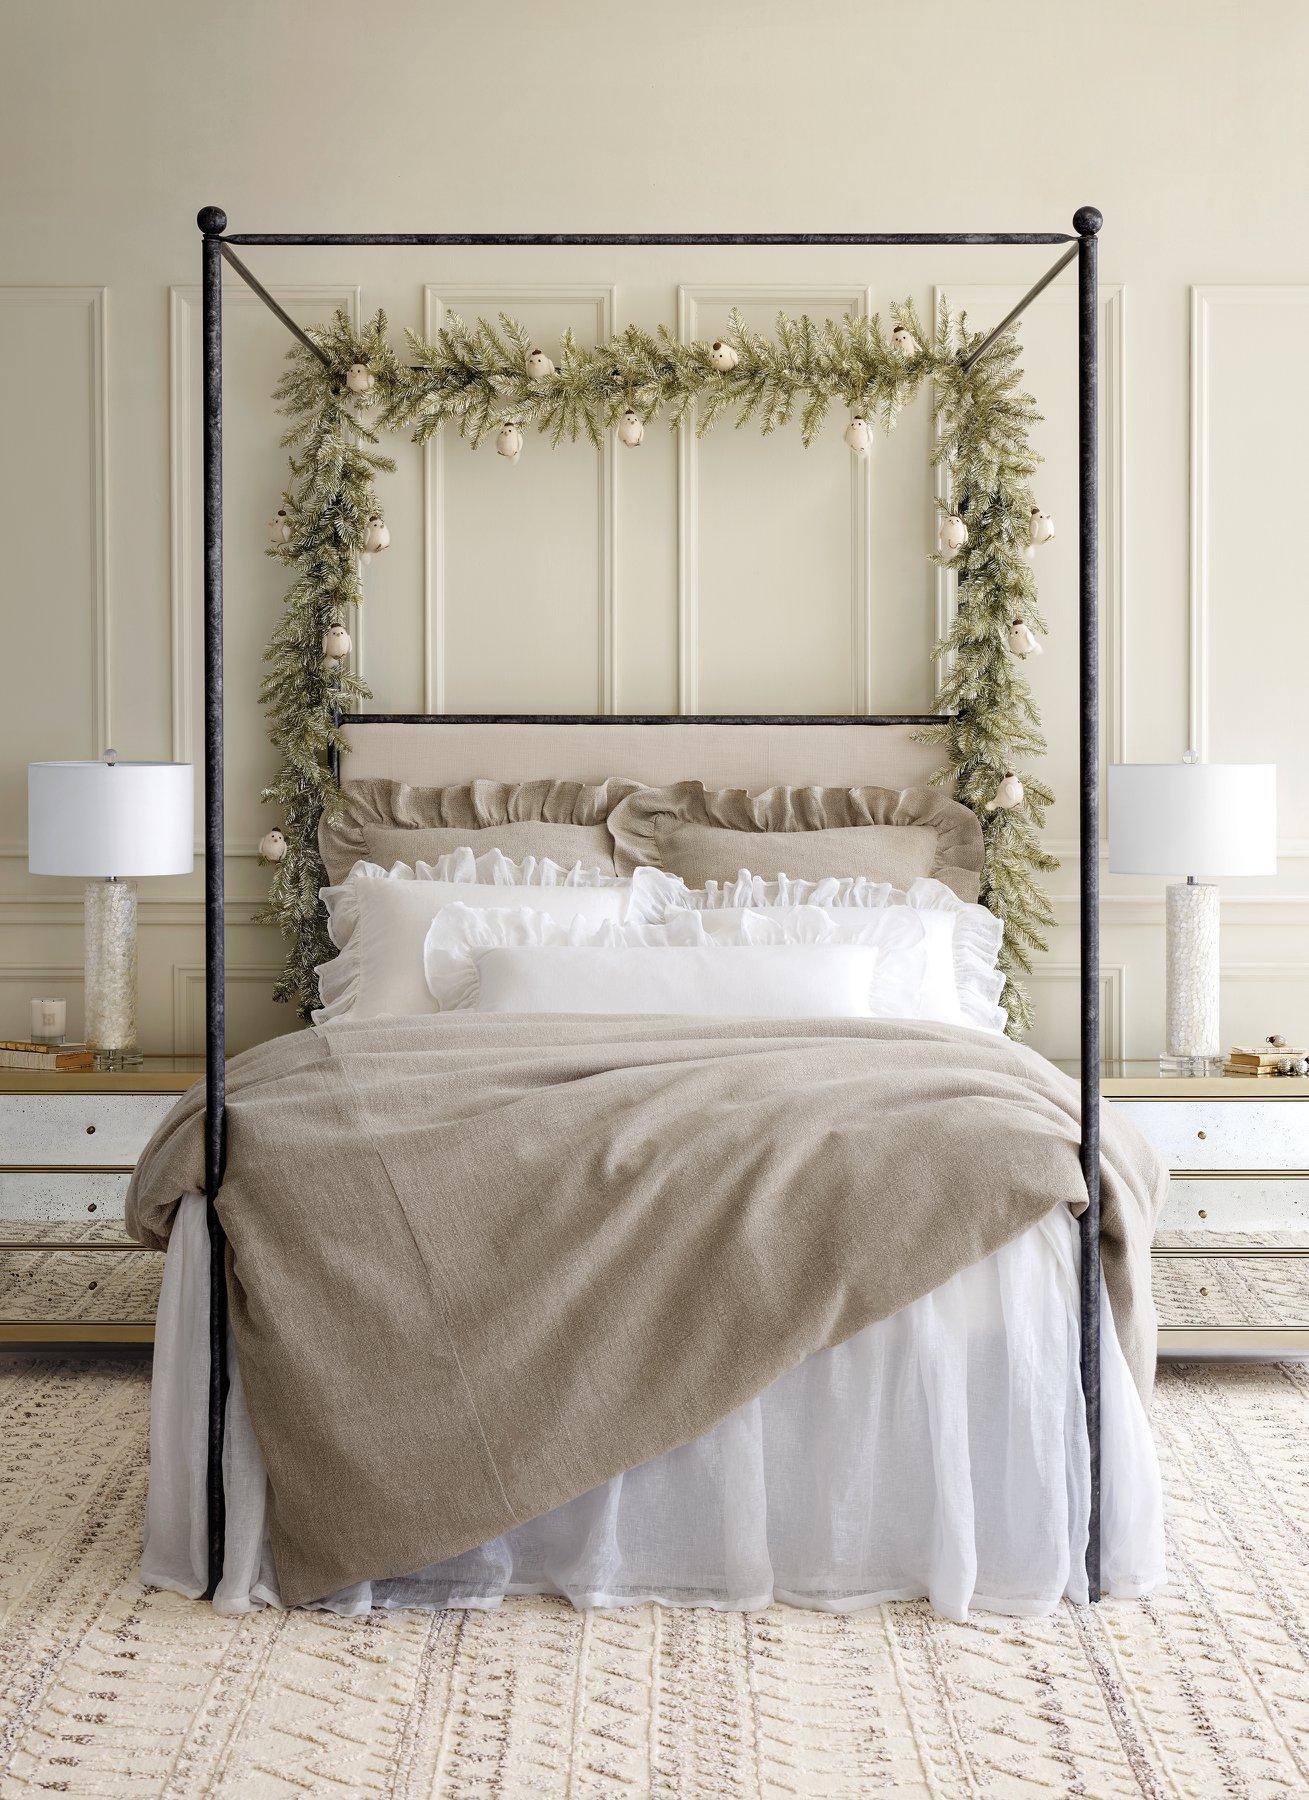 Annabelles Linens Fine Linens Sleepwear Gifts